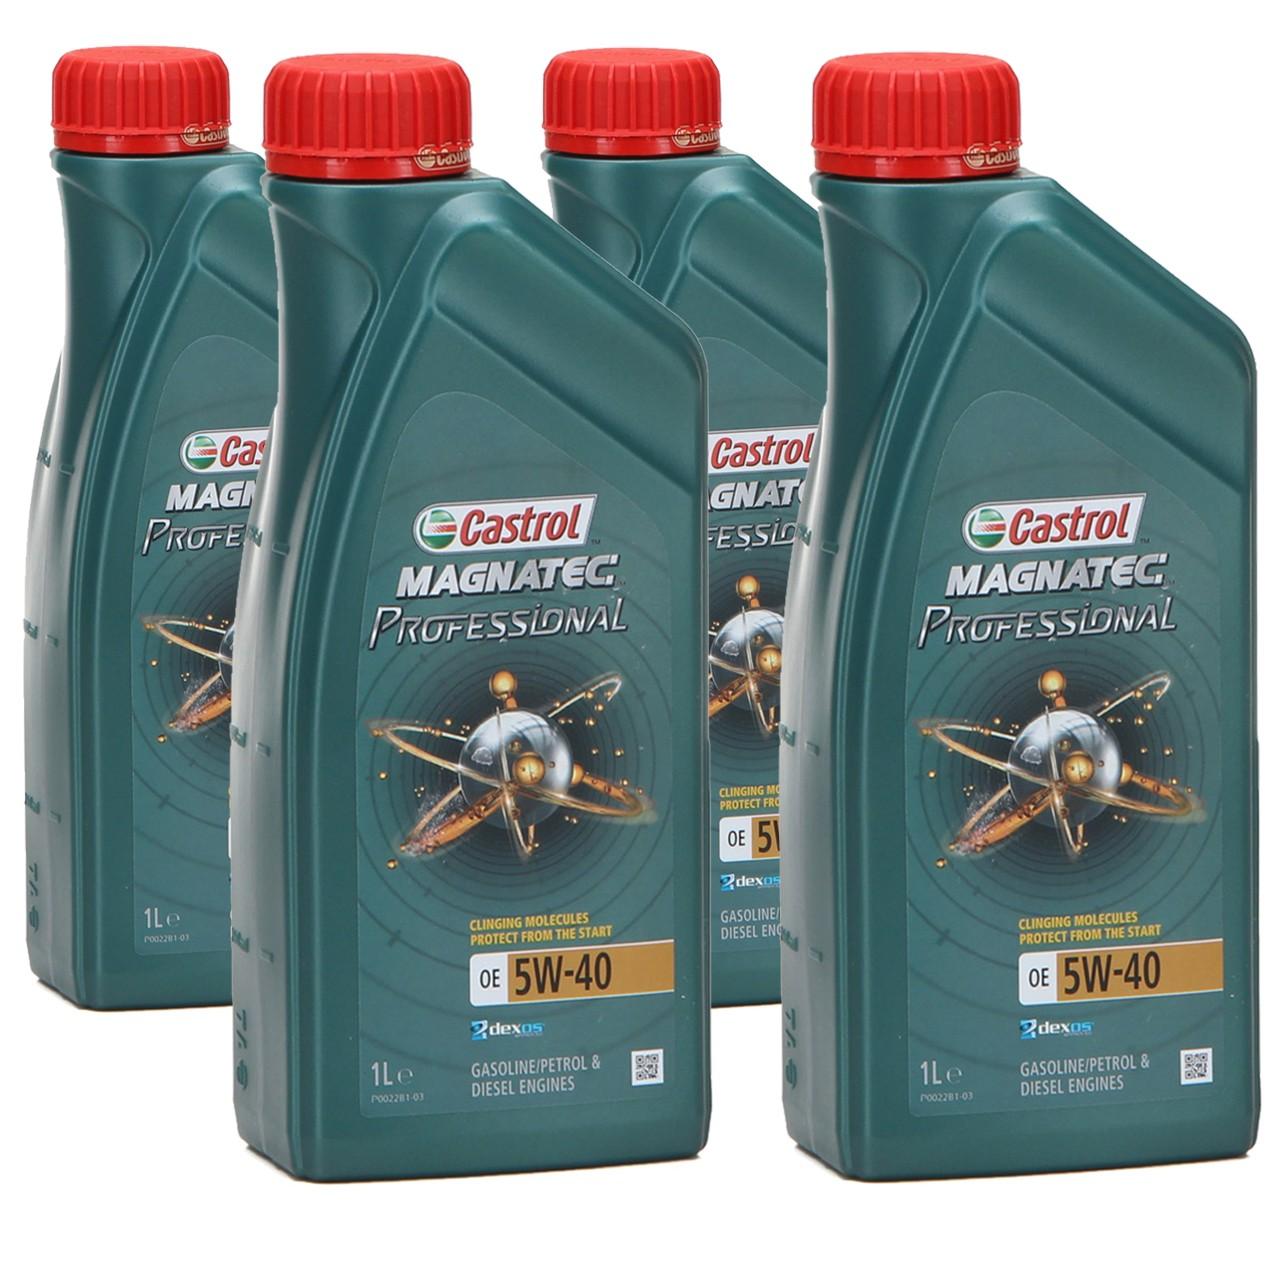 CASTROL Magnatec Professional Motoröl OE 5W40 dexos2 Ford WSS-M2C917-A - 4 Liter